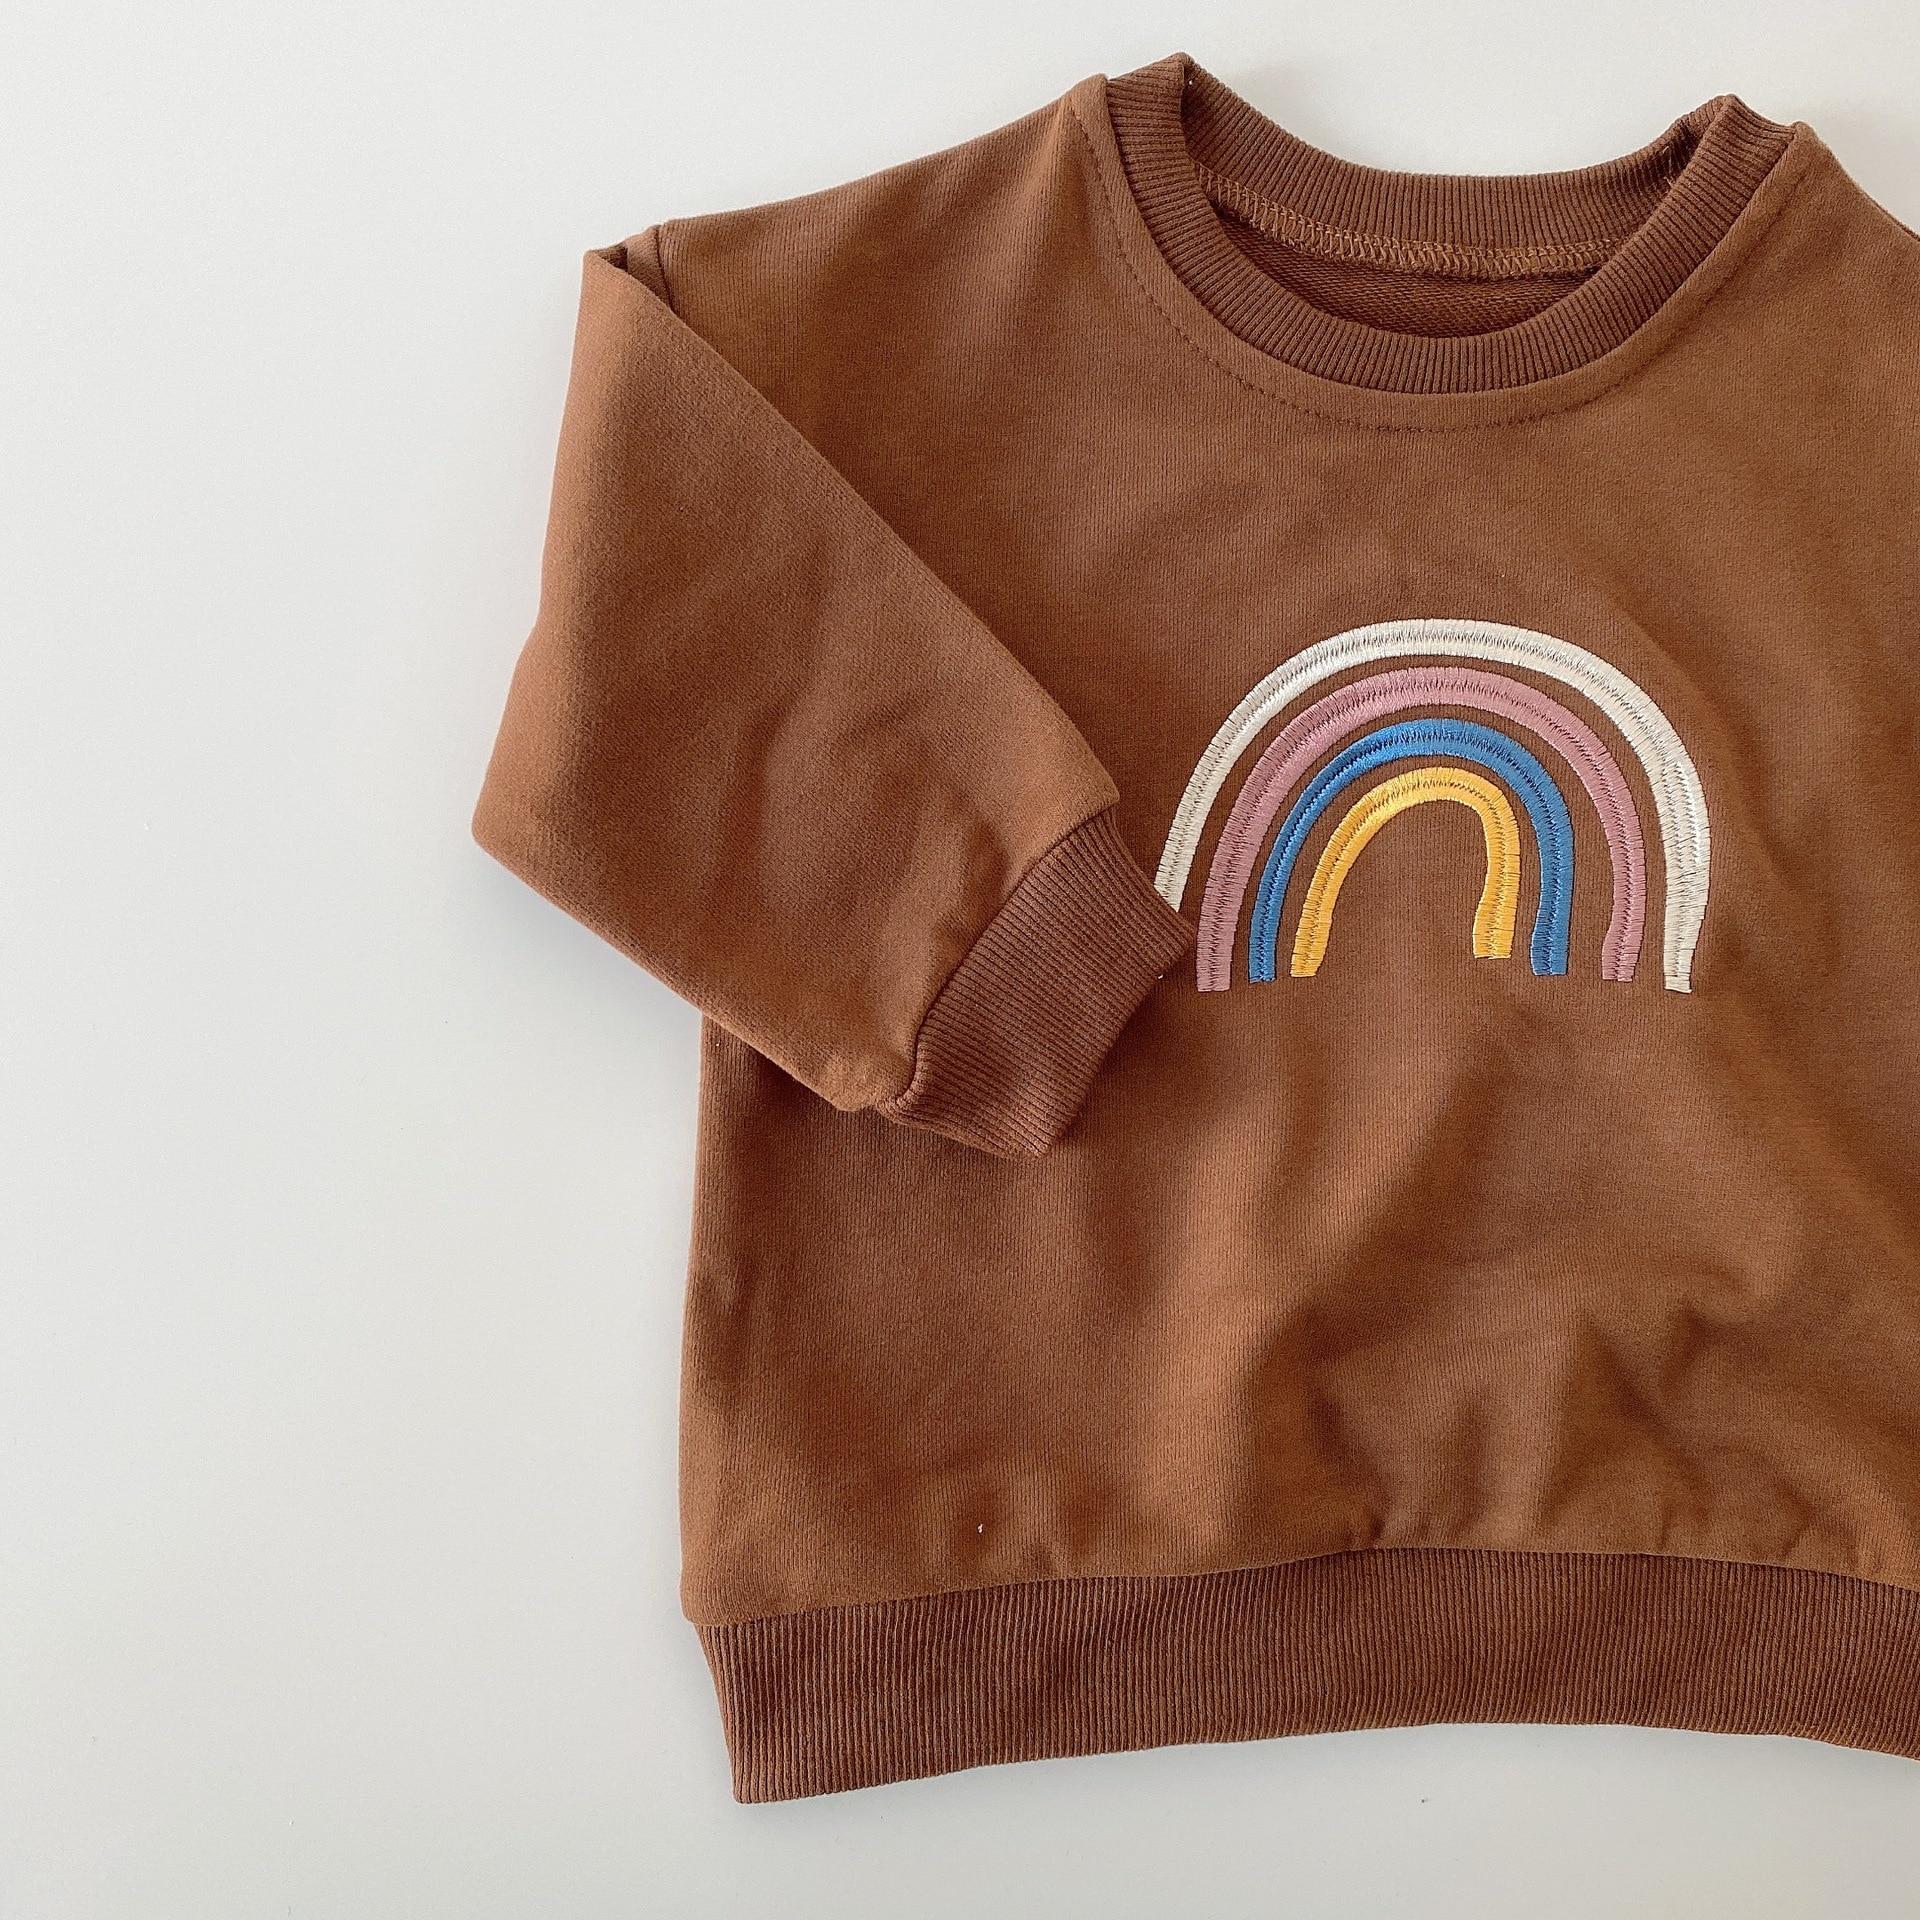 Autumn Baby Girls Embroidery Rainbow Sweatshirts Long Sleeve Tops Kids Toddler Boys Pullover Sweatshirt Rainbow T-shirt Clothes 3